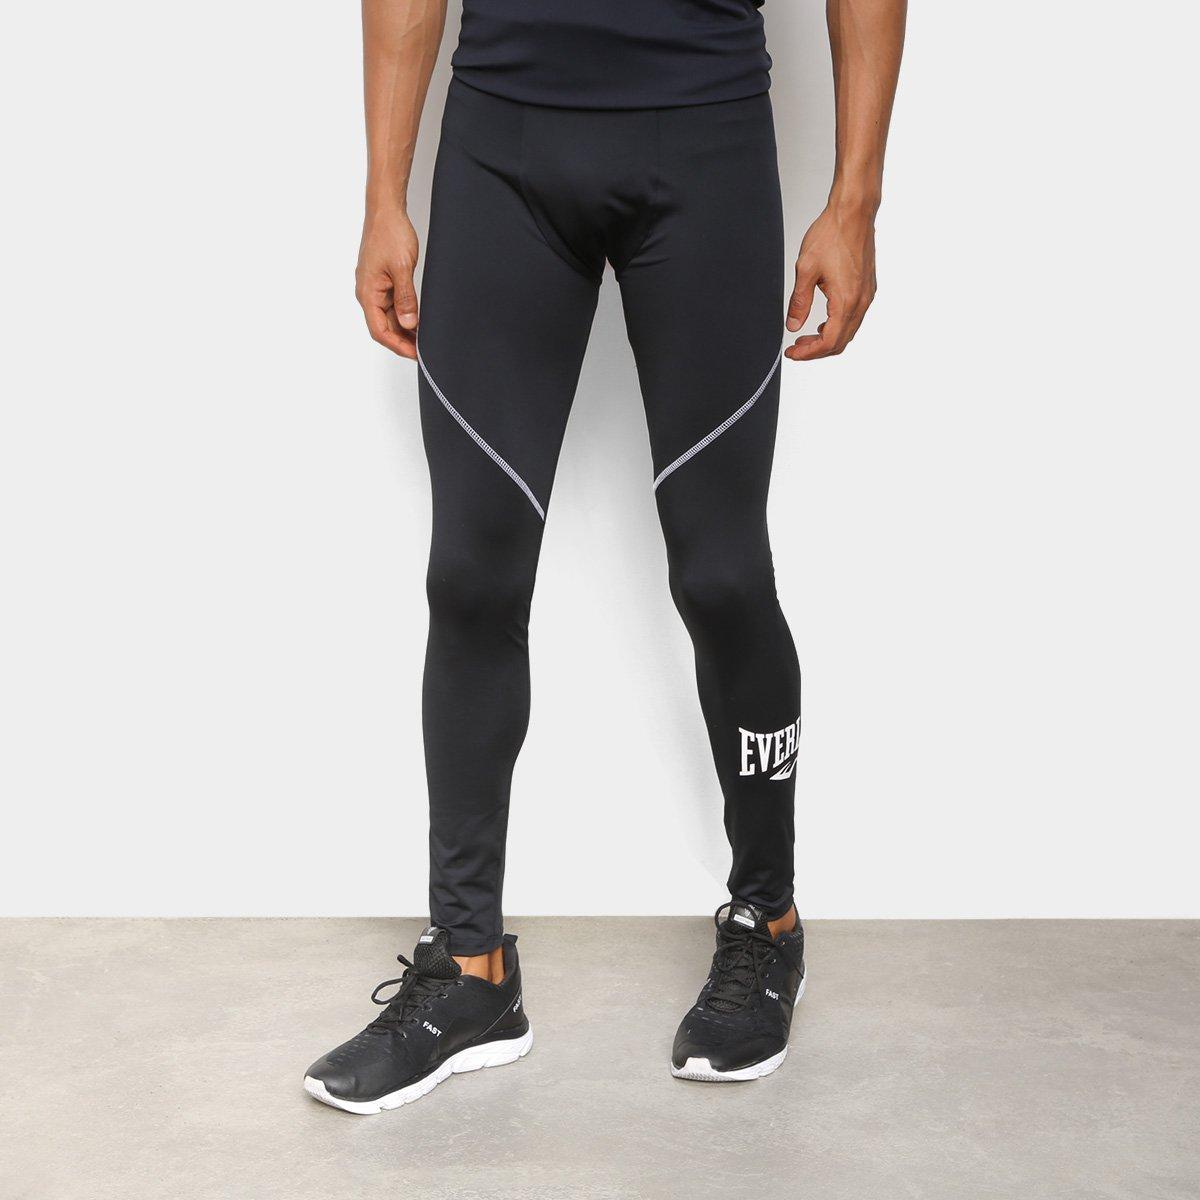 Calça Legging Everlast Workout Masculina